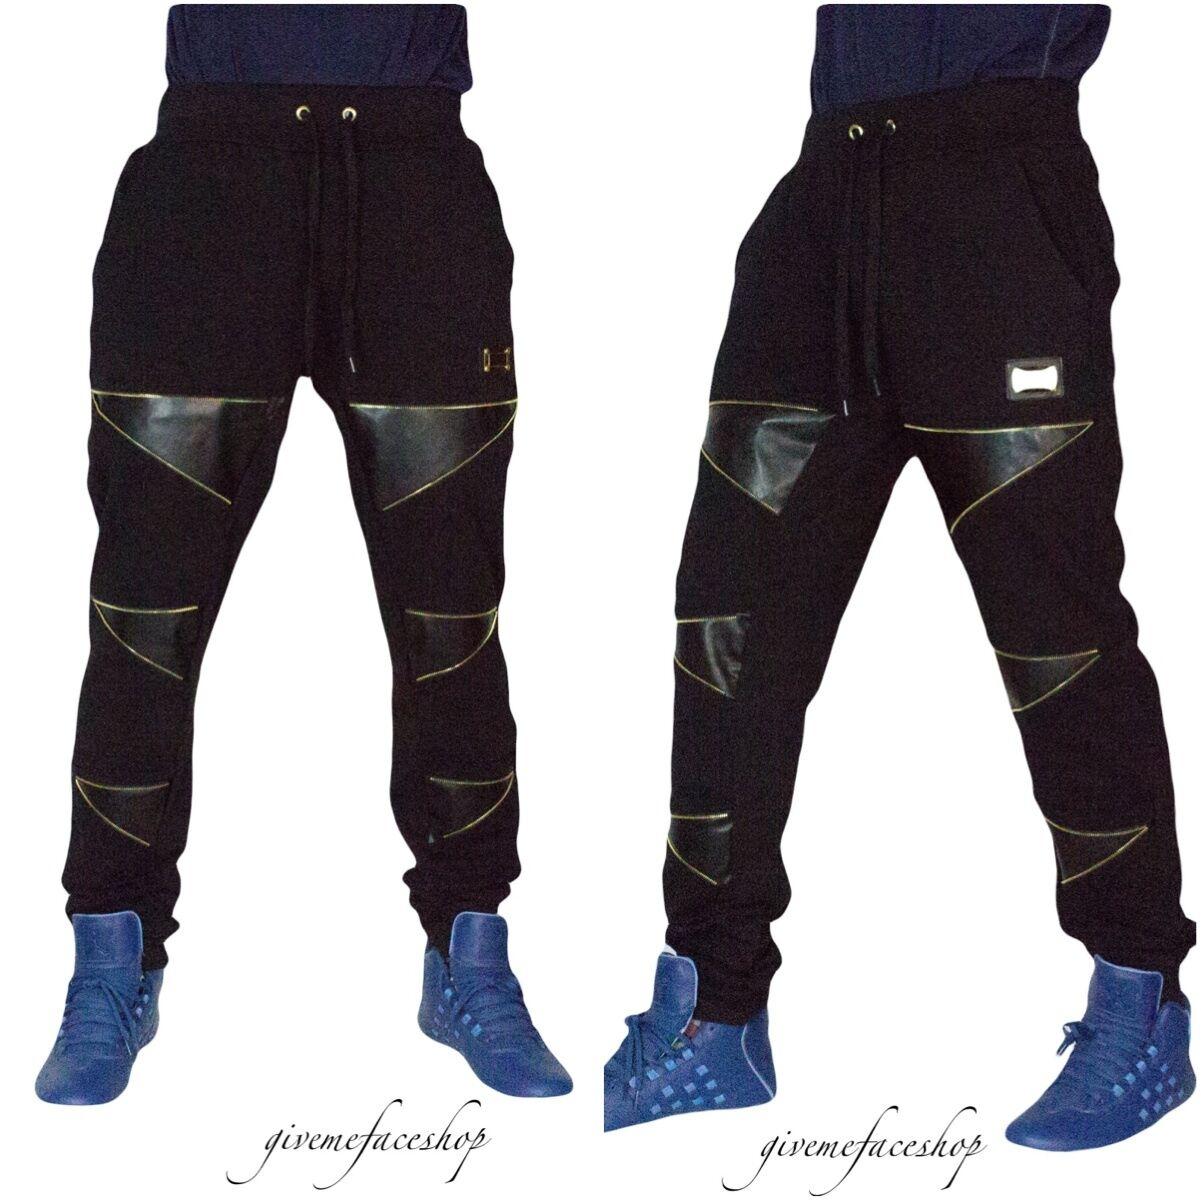 Time Is Money G Jogginghose     Zip-Star   Kunstleder Jogginghose, Schwarze Herren | Viele Sorten  72aa2a